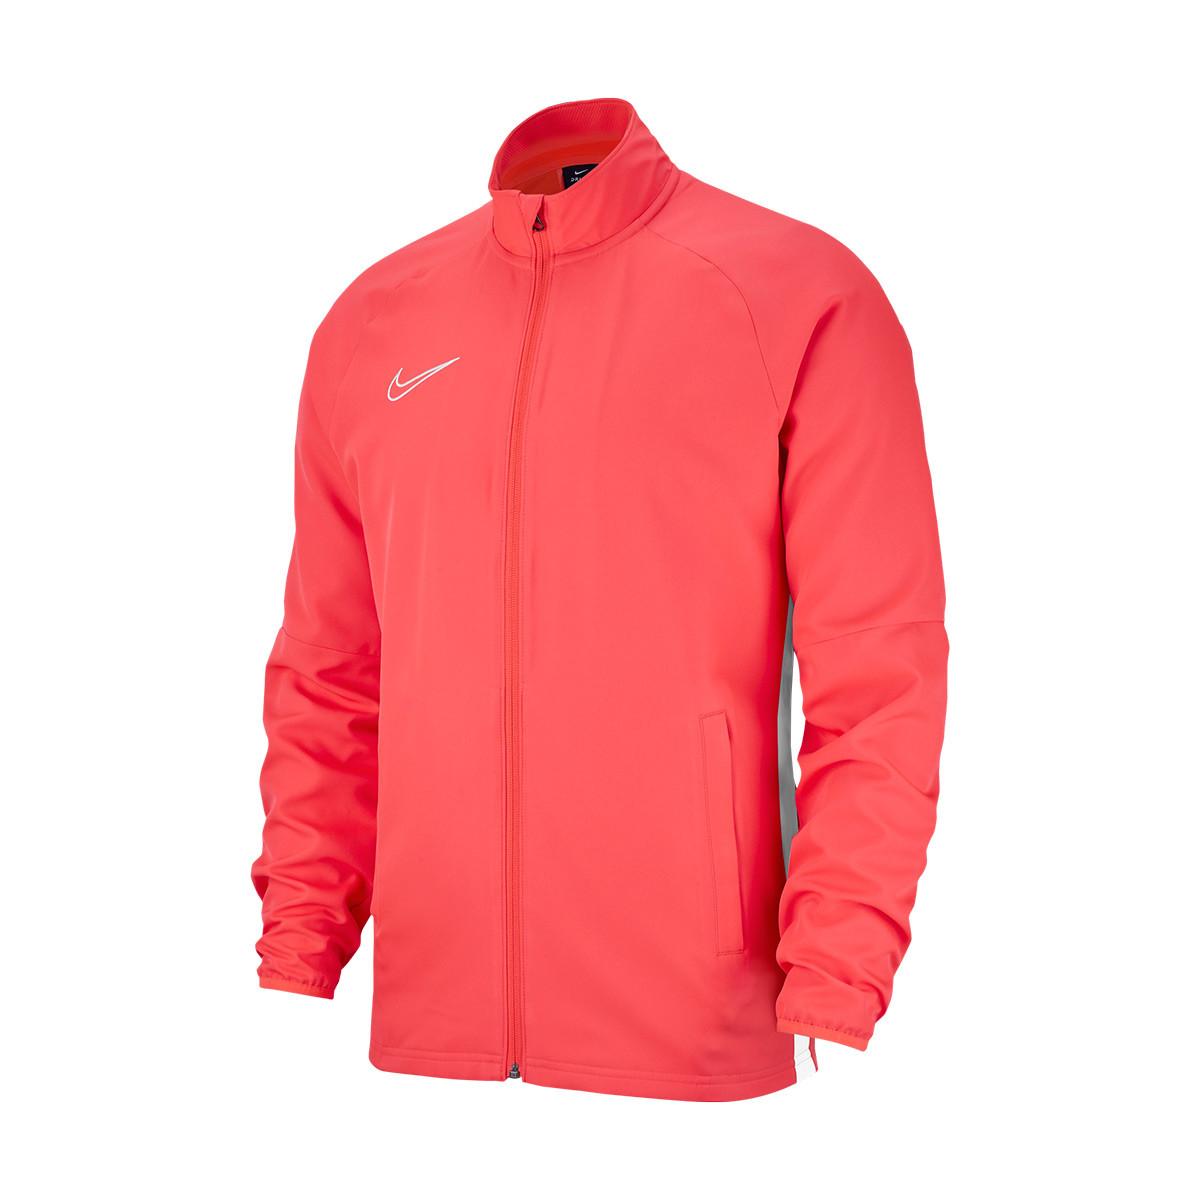 Superioridad trabajo Con rapidez  Jacket Nike Academy 19 Knit Woven Bright crimson-White - Football store  Fútbol Emotion